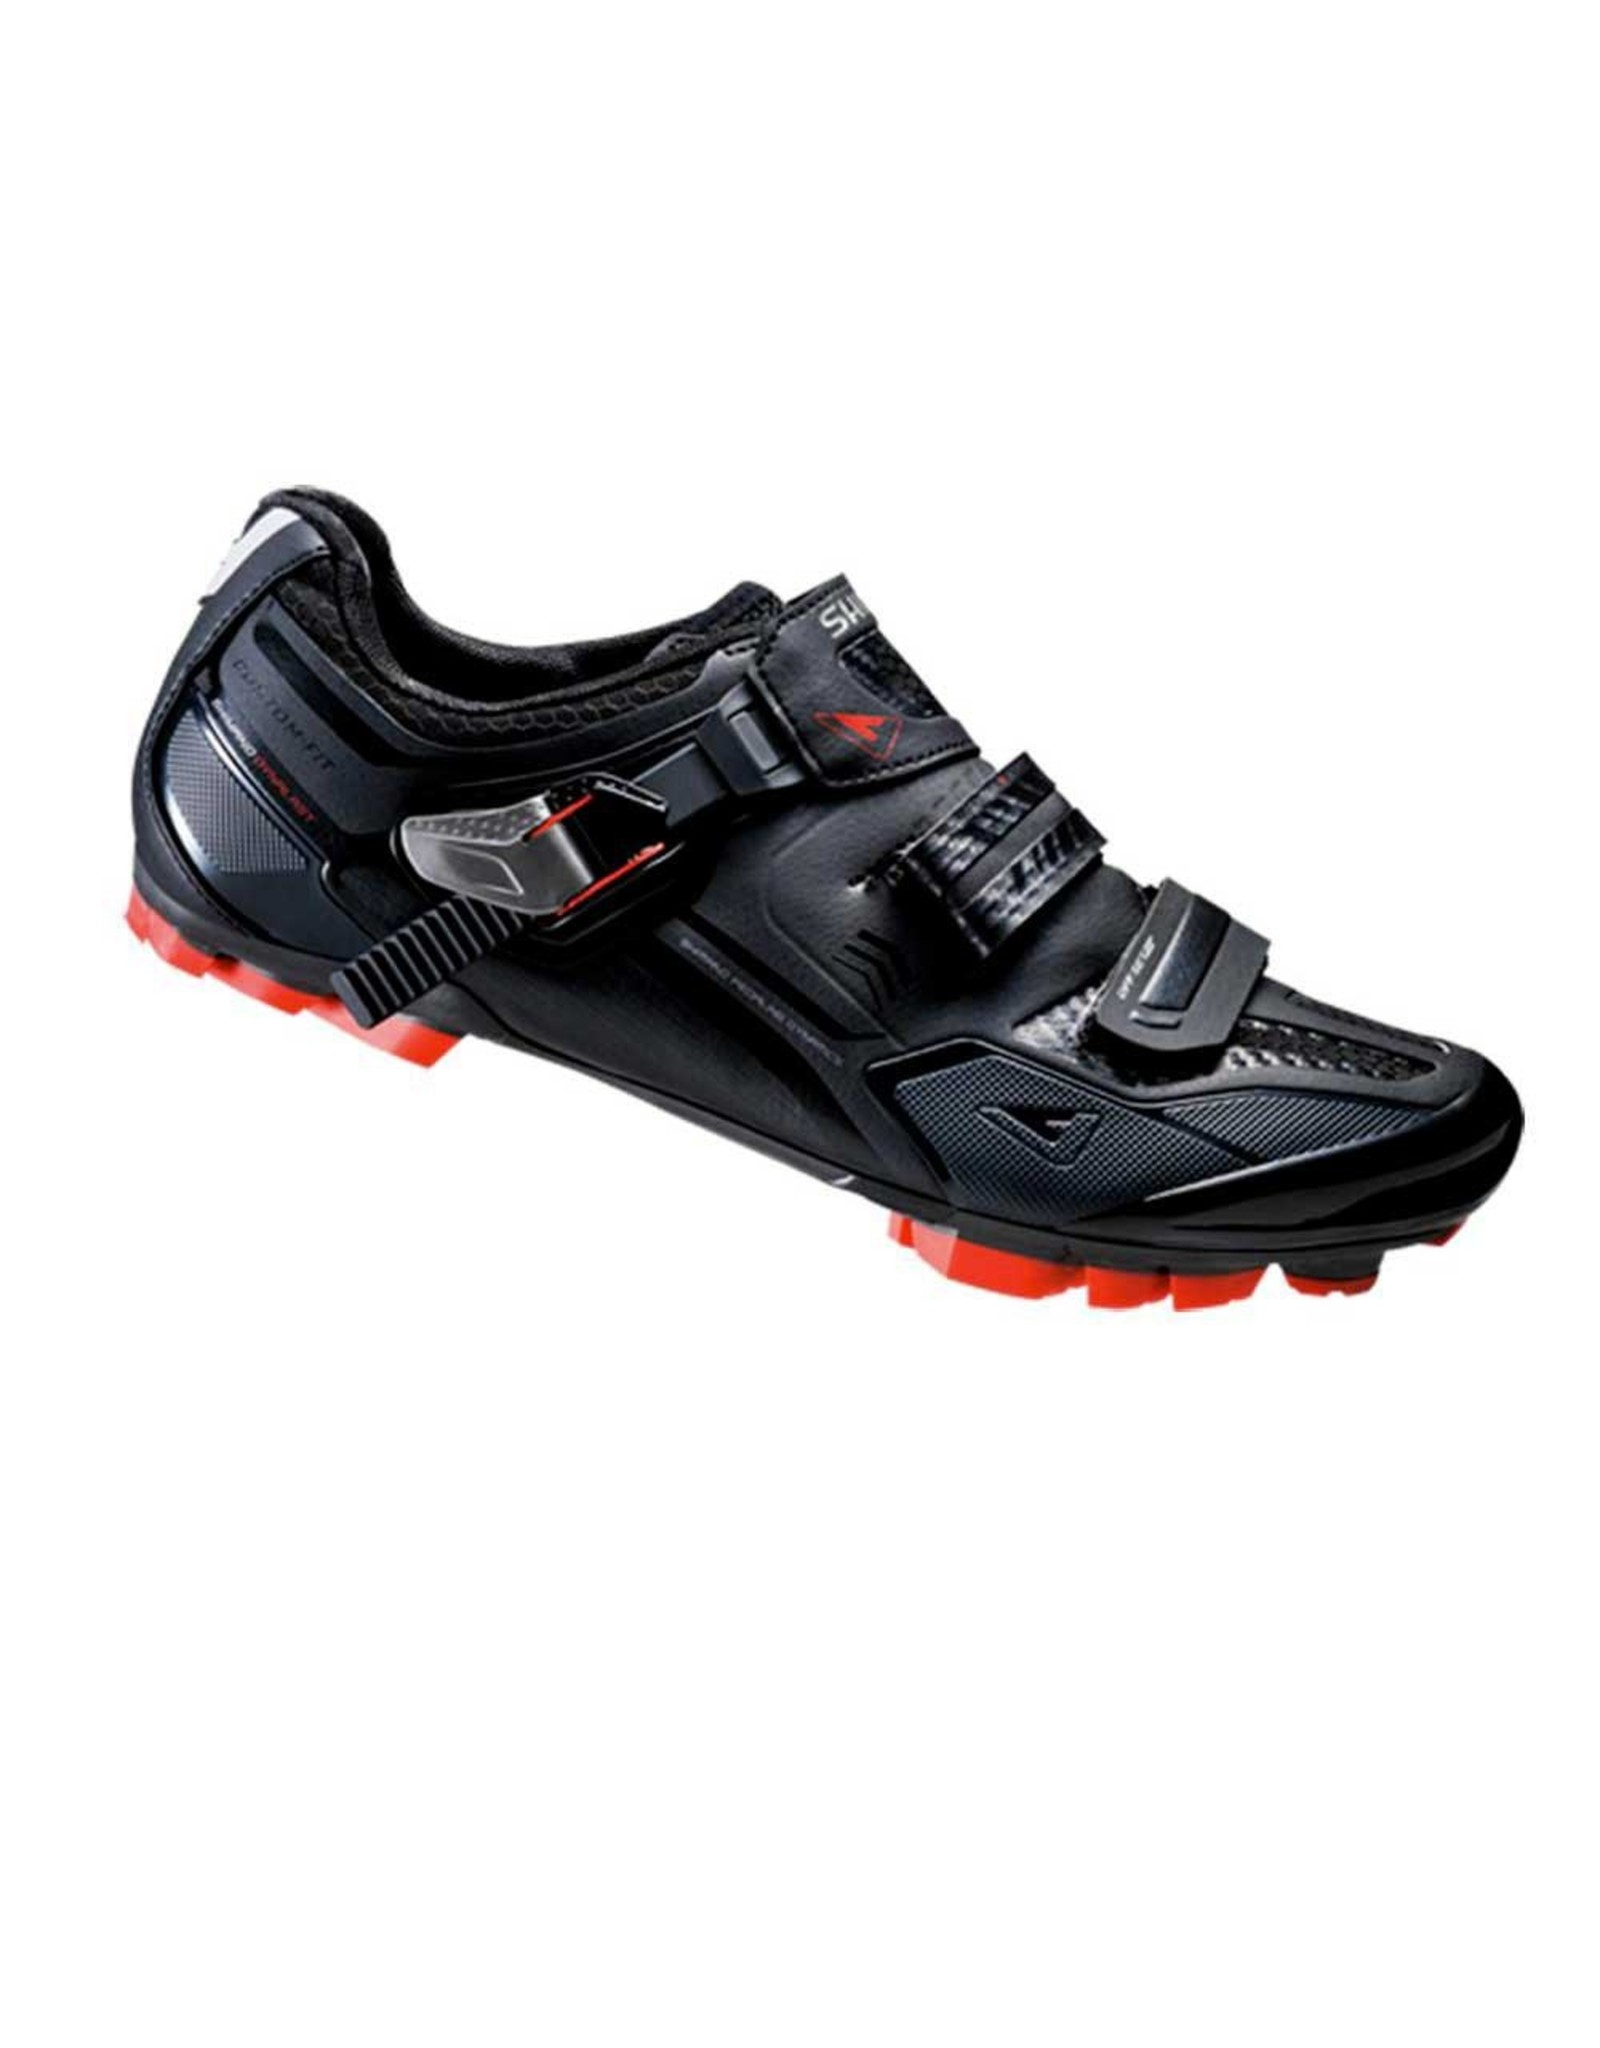 SHIMANO Men's SH-XC70 XC Racing Shoe BLACK 43 (Reg price $379.99)